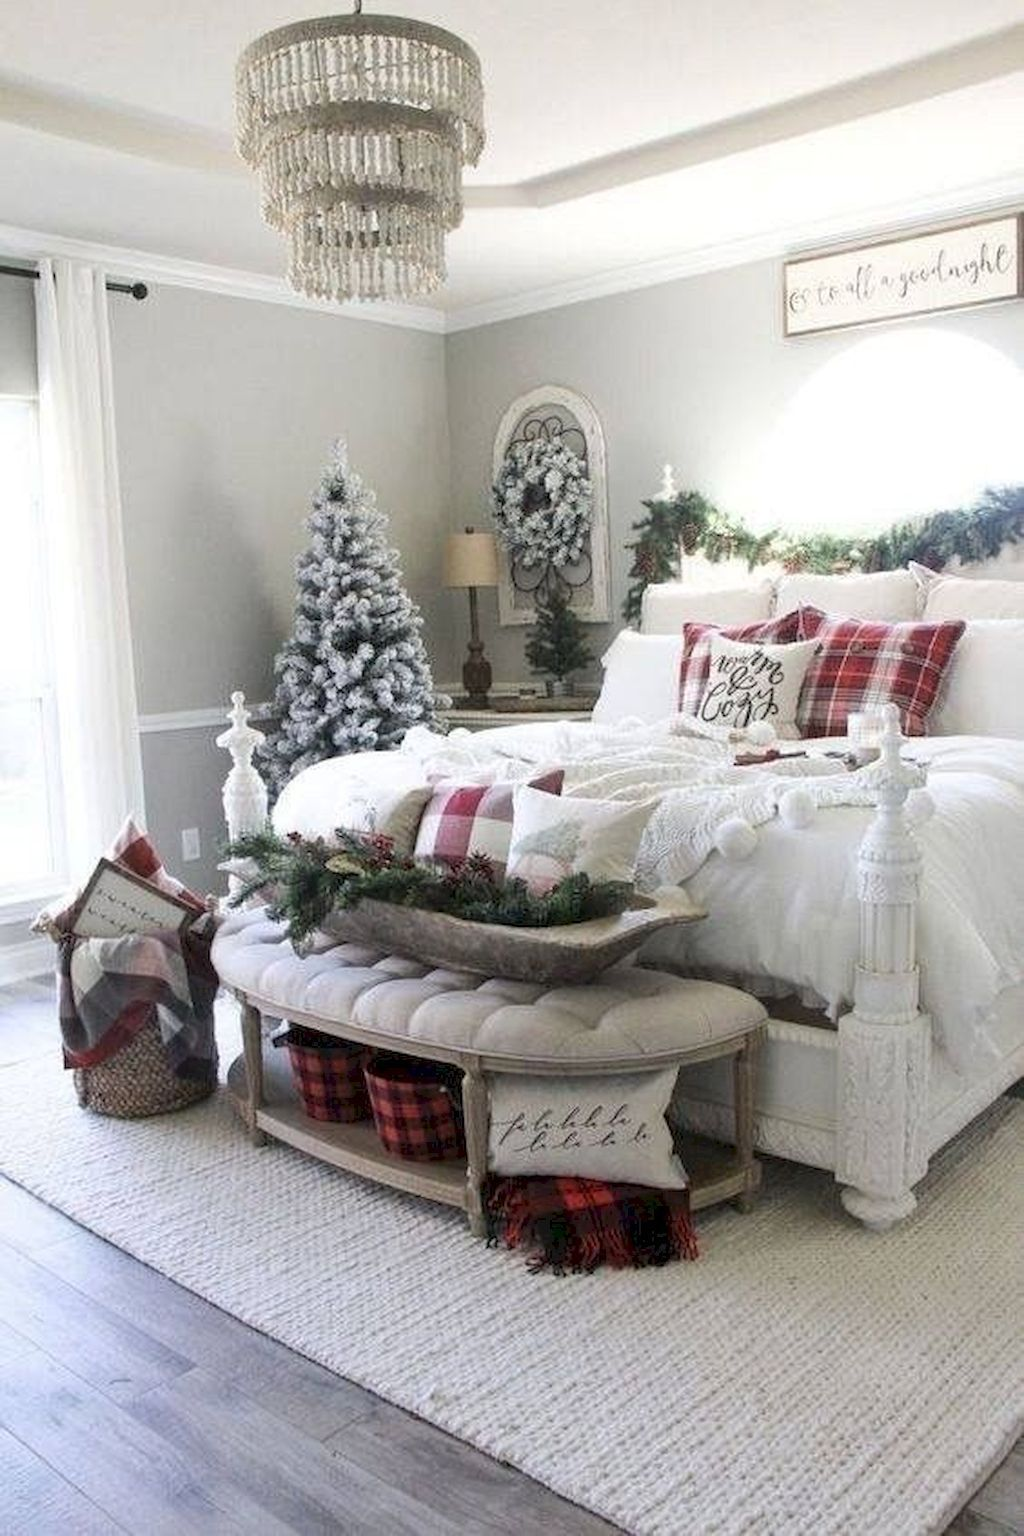 56 Easy Diy Christmas Decorations Ideas For Bedroom Christmas Room Decor Christmas Decorations Bedroom Christmas Bedroom A cozy christmas bedroom